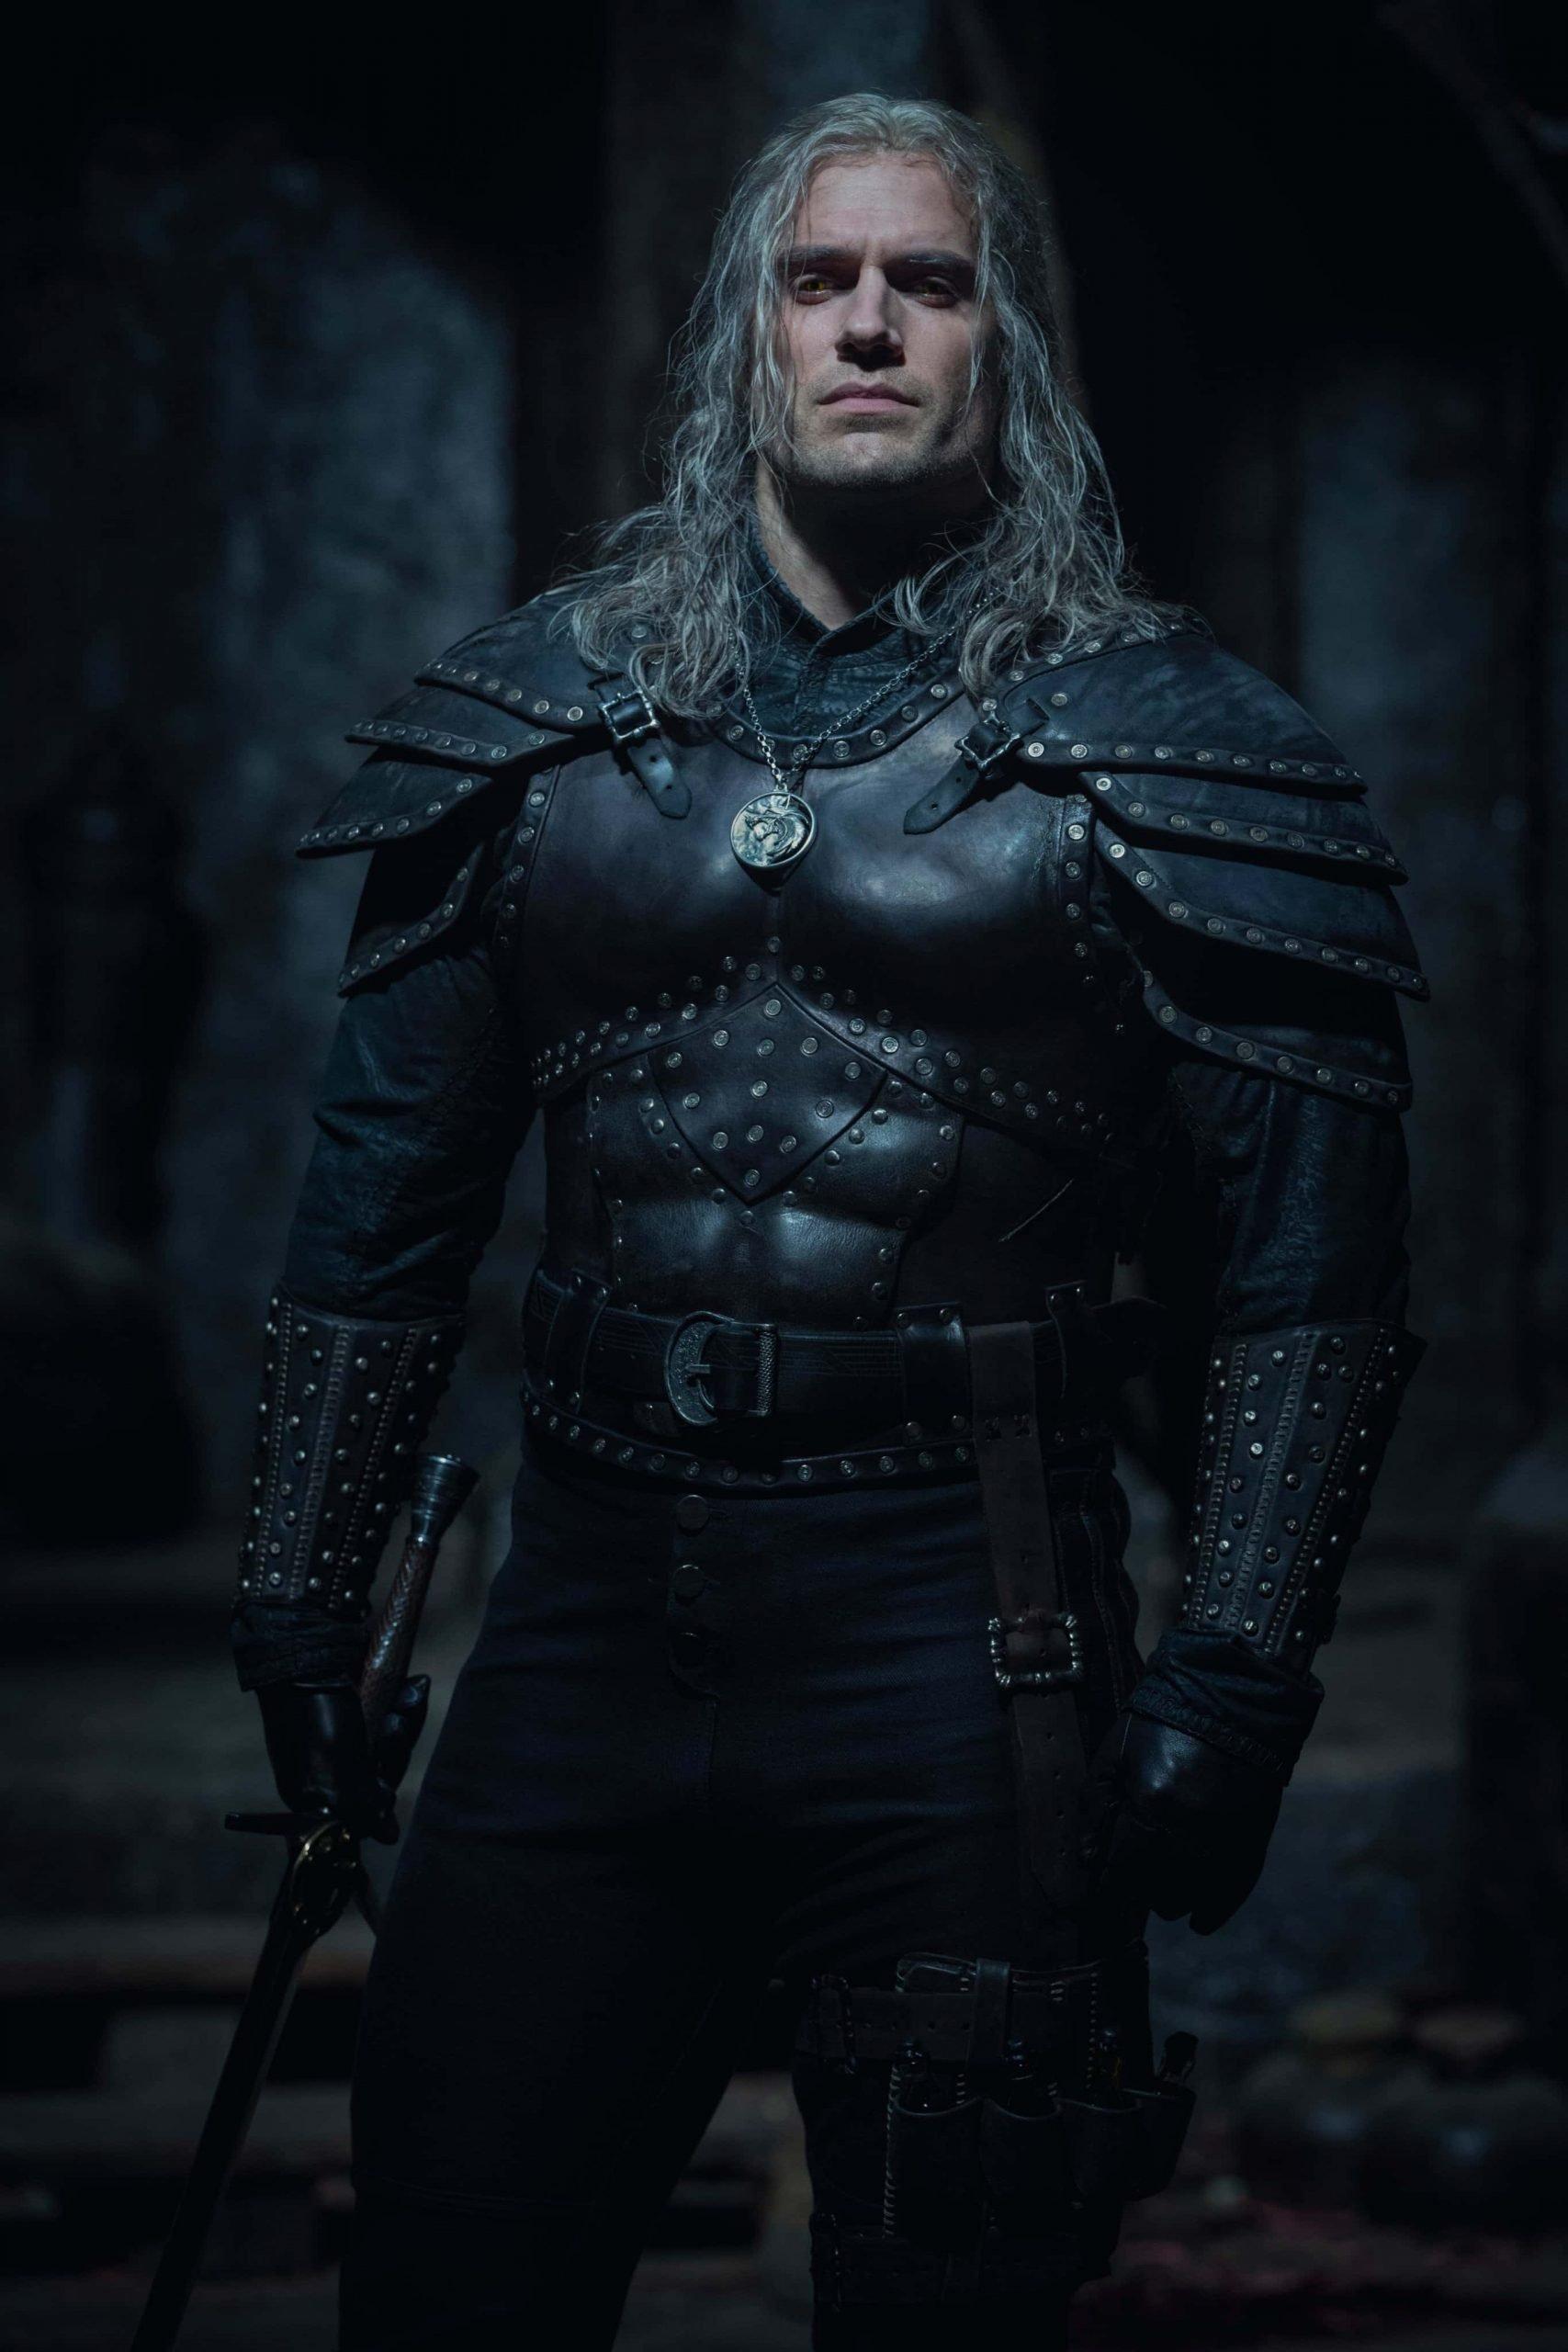 The Witcher 2 armatura Geralt